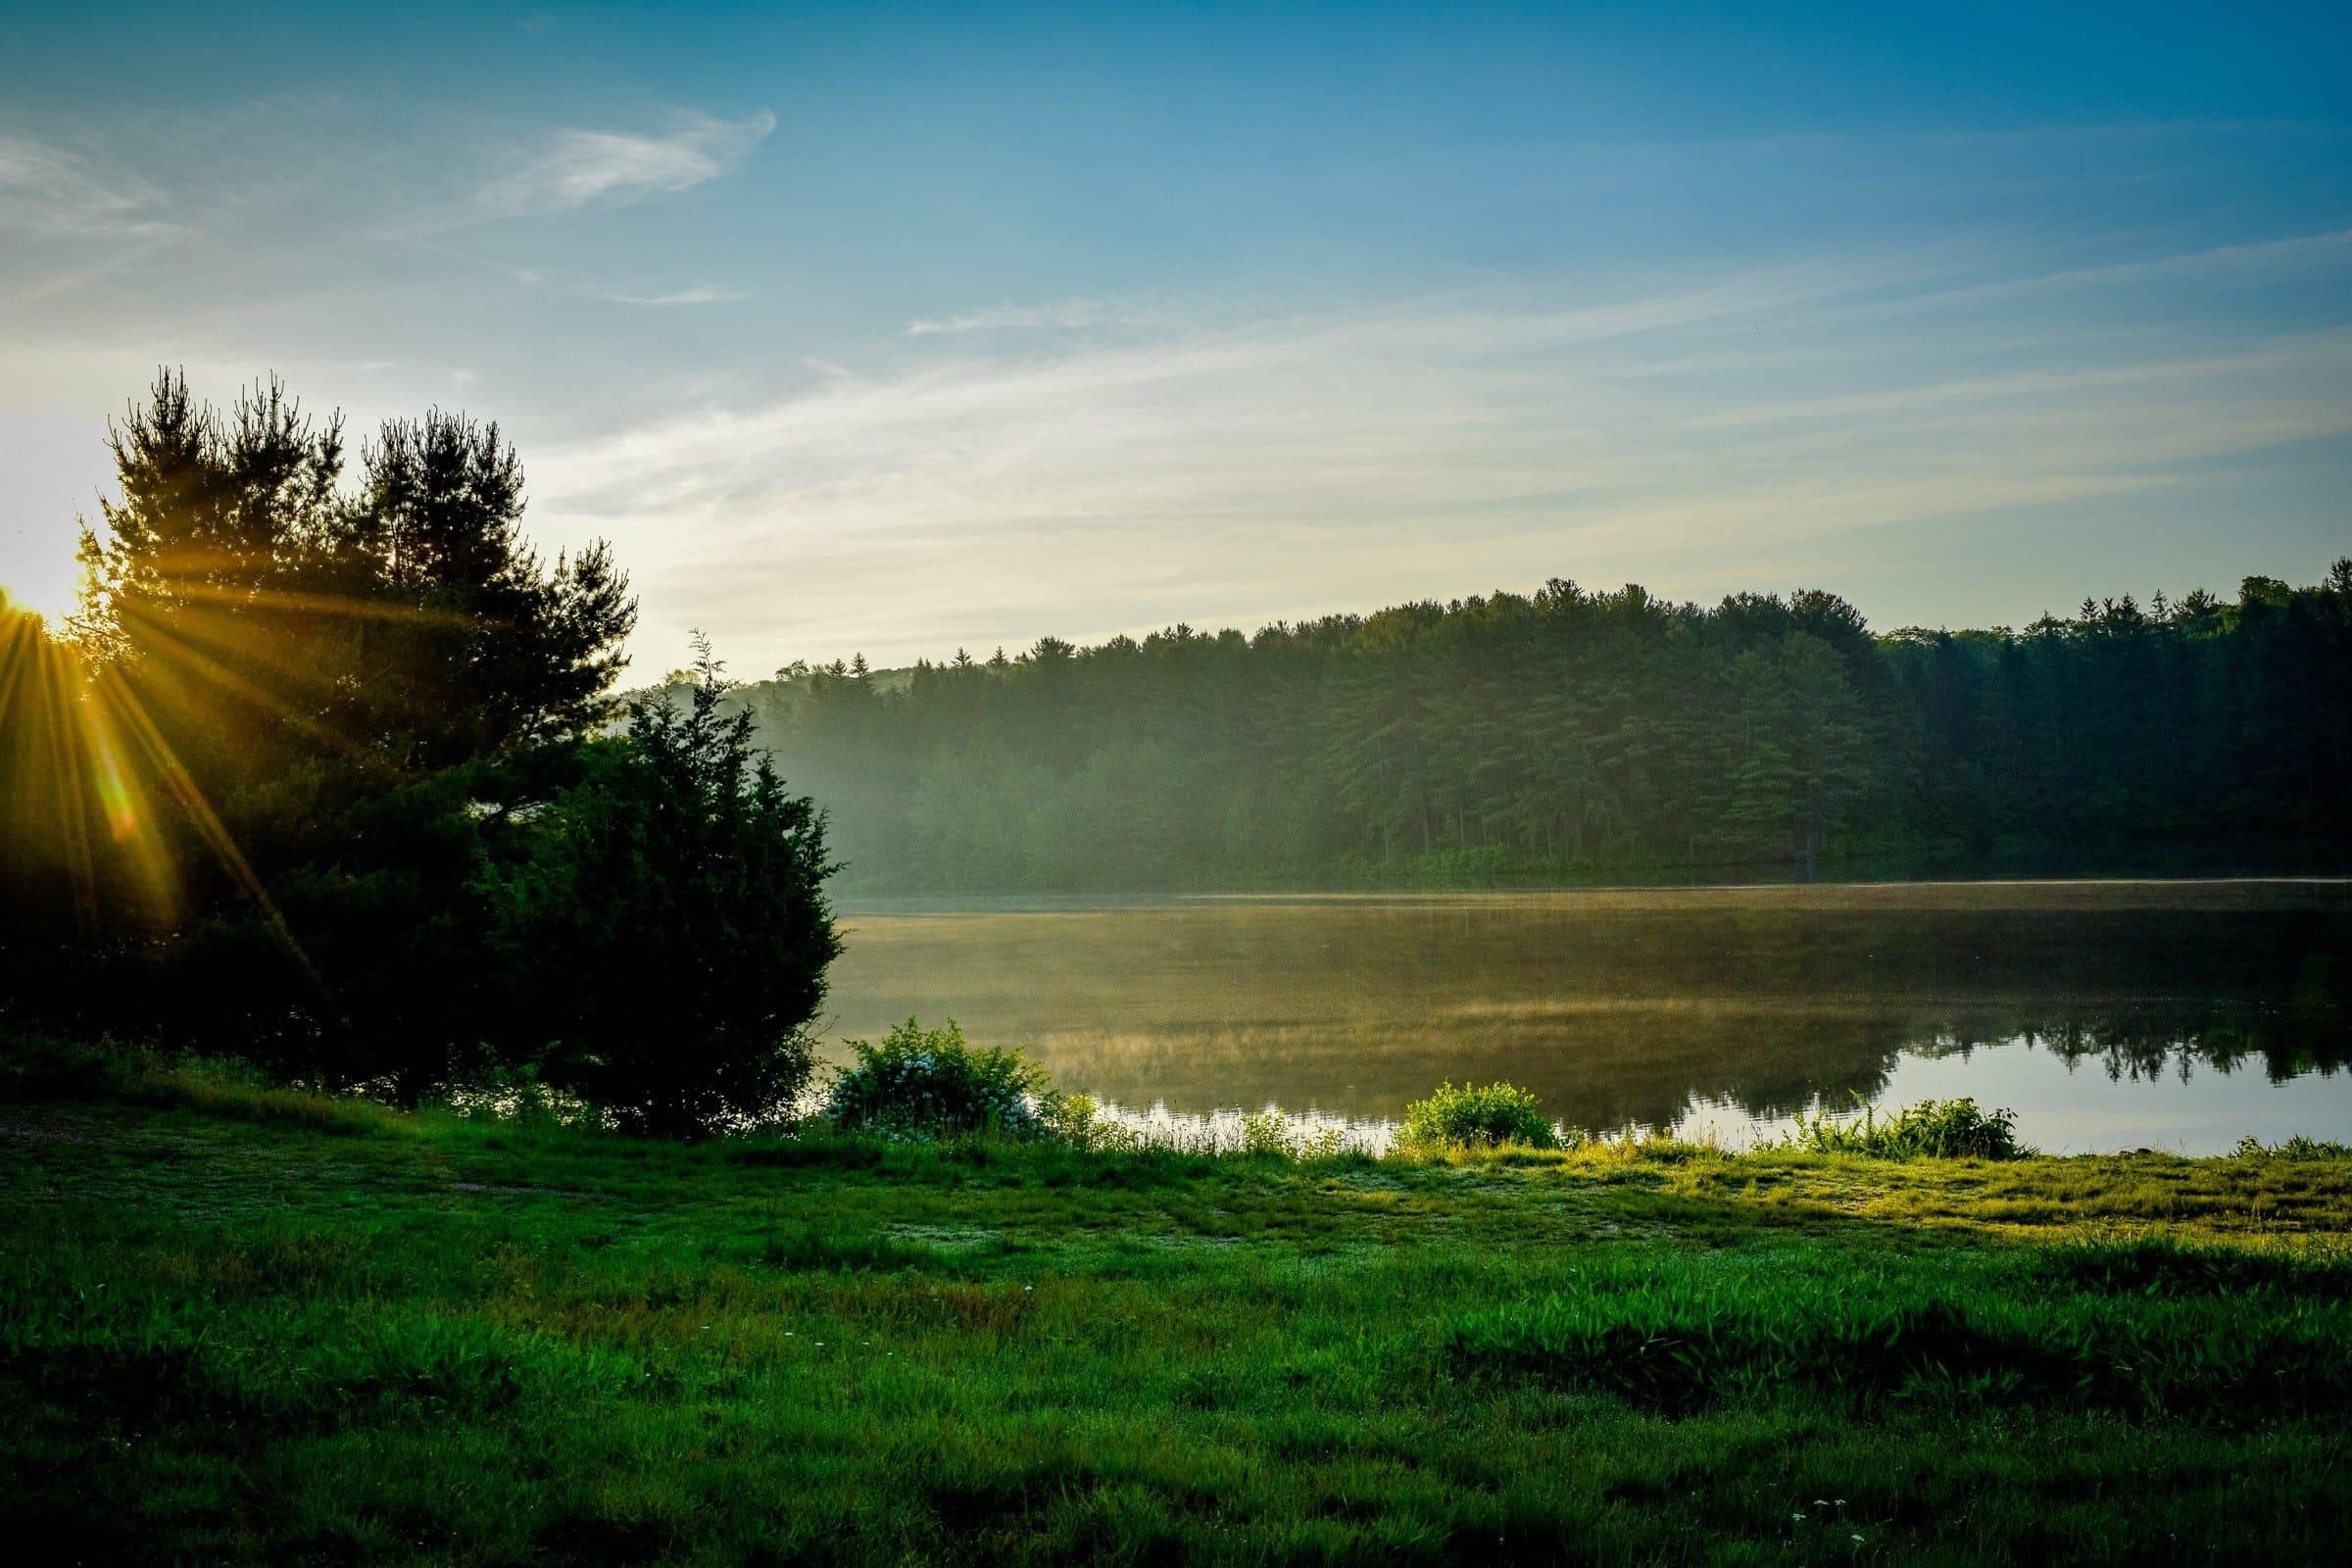 Buckingham Reservoir